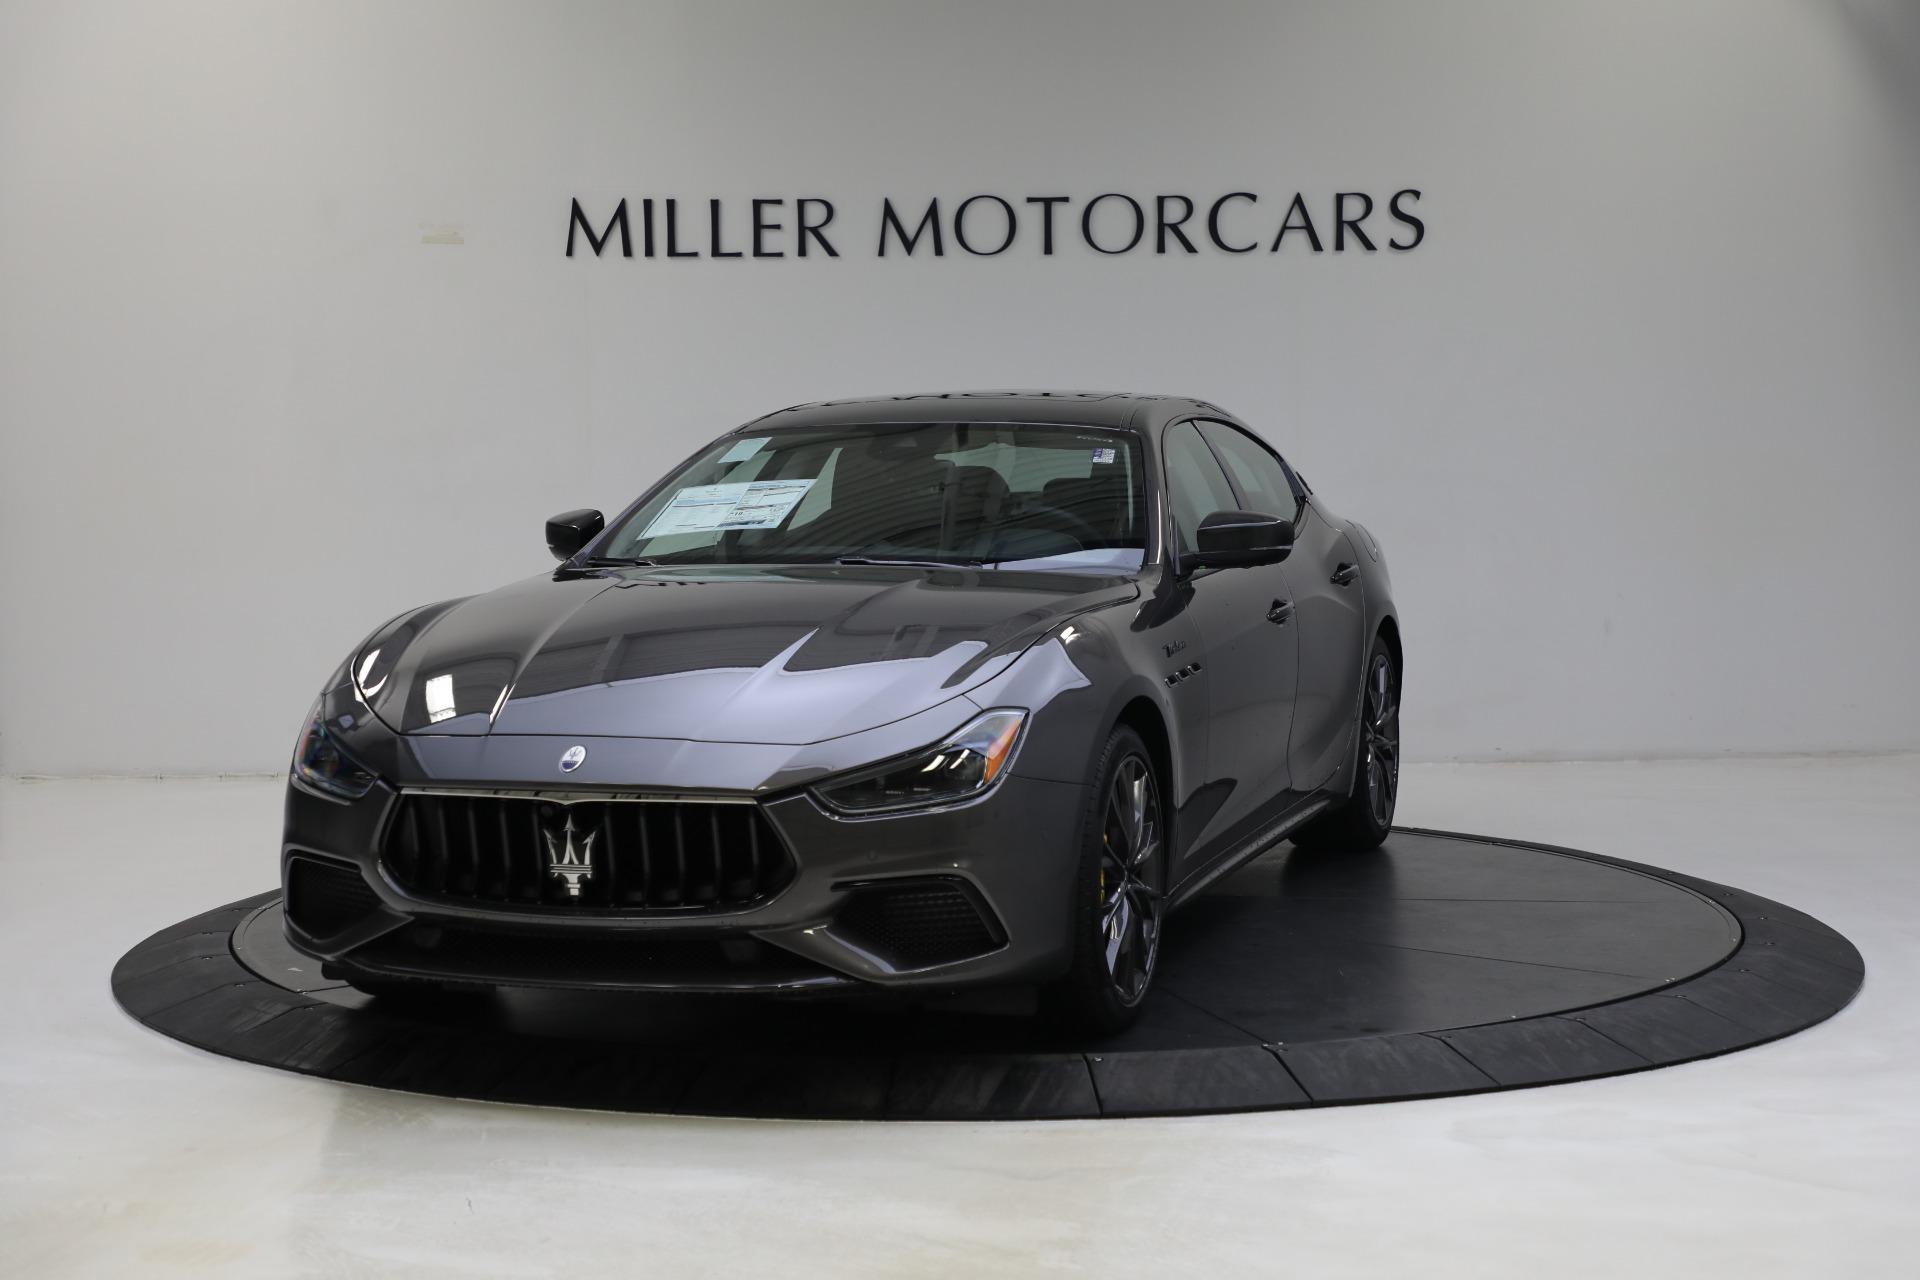 New 2022 Maserati Ghibli Modena Q4 for sale $103,855 at Alfa Romeo of Greenwich in Greenwich CT 06830 1